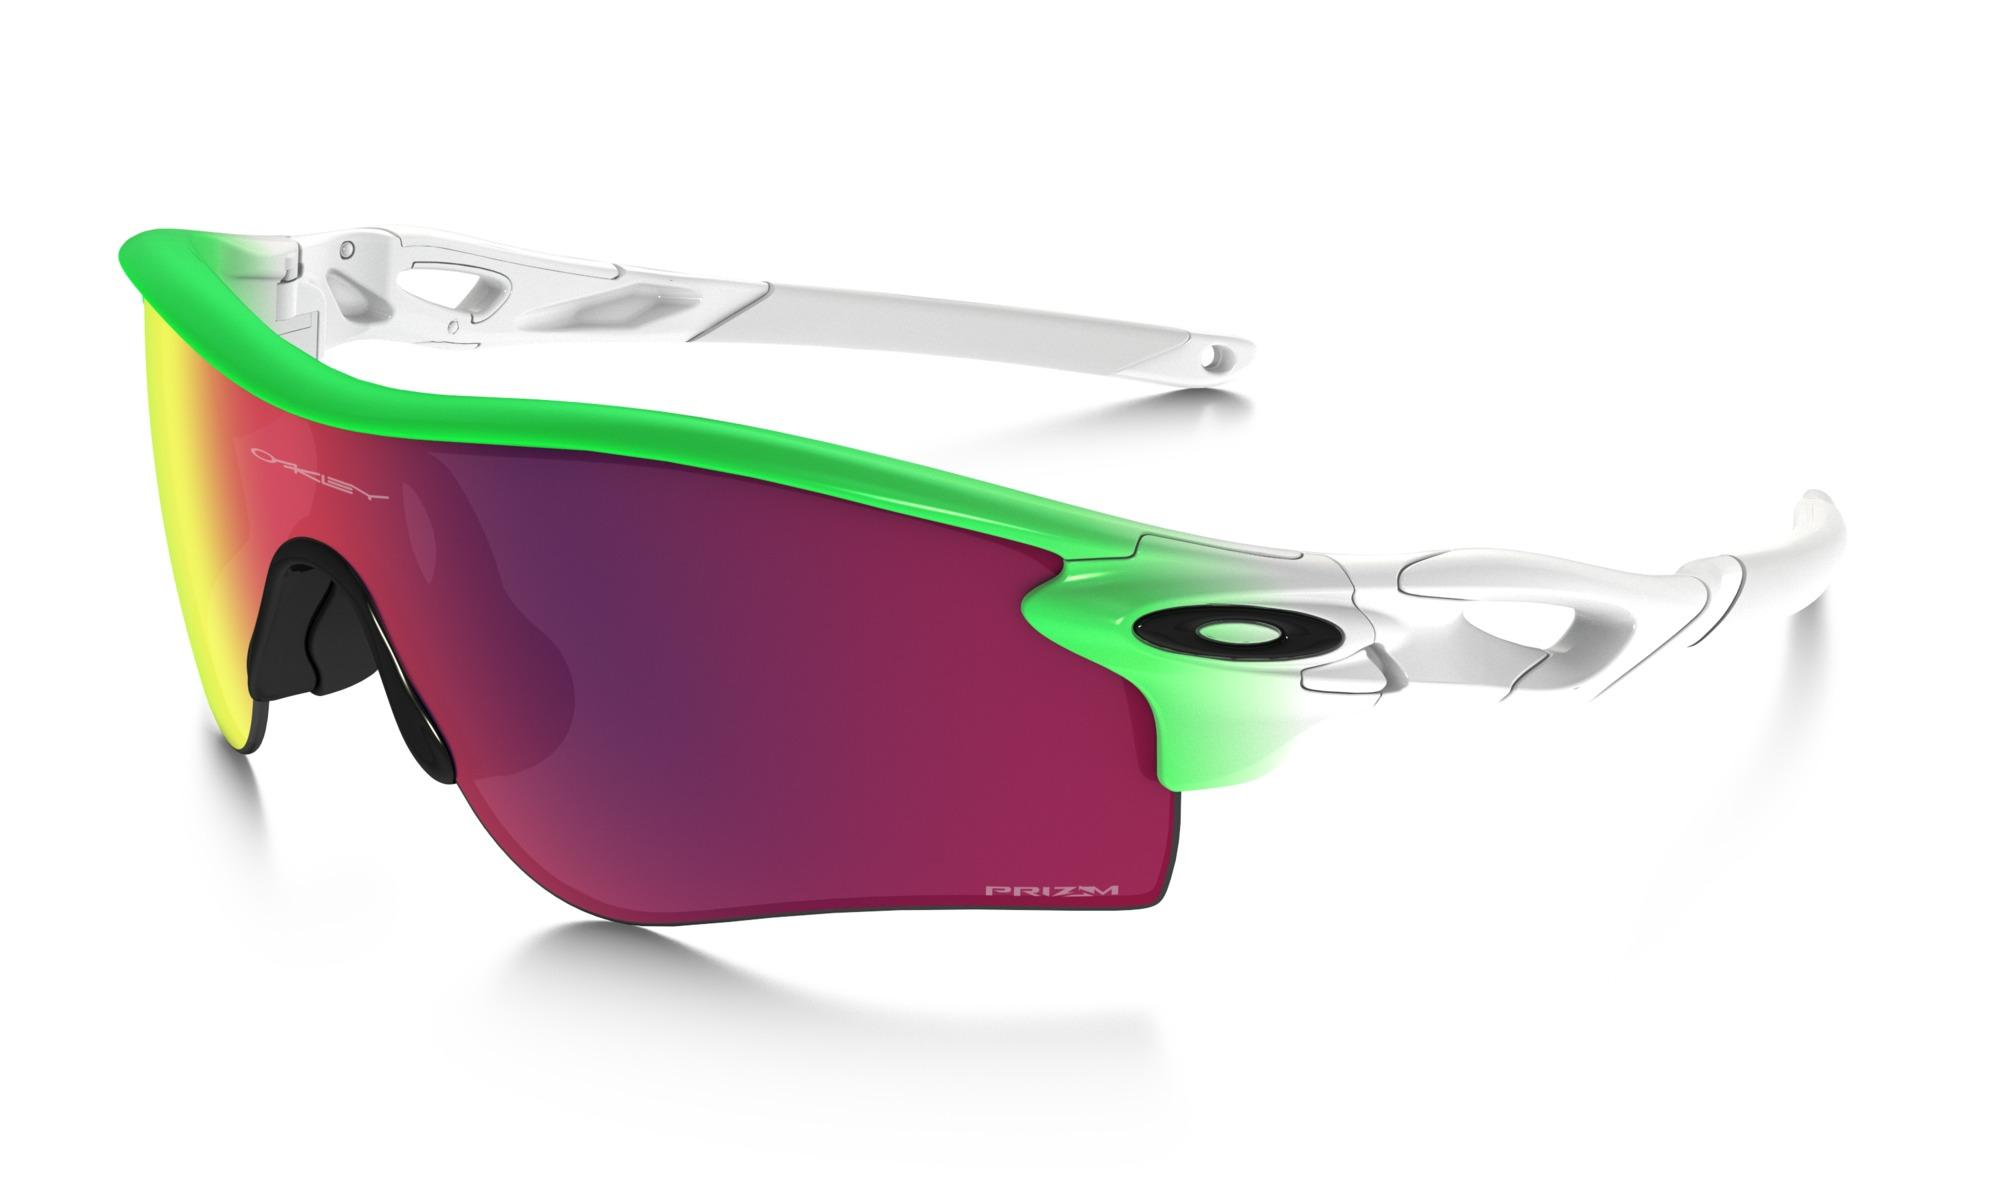 9095d6fc8c Oakley Radar Path Womens Sunglasses « One More Soul